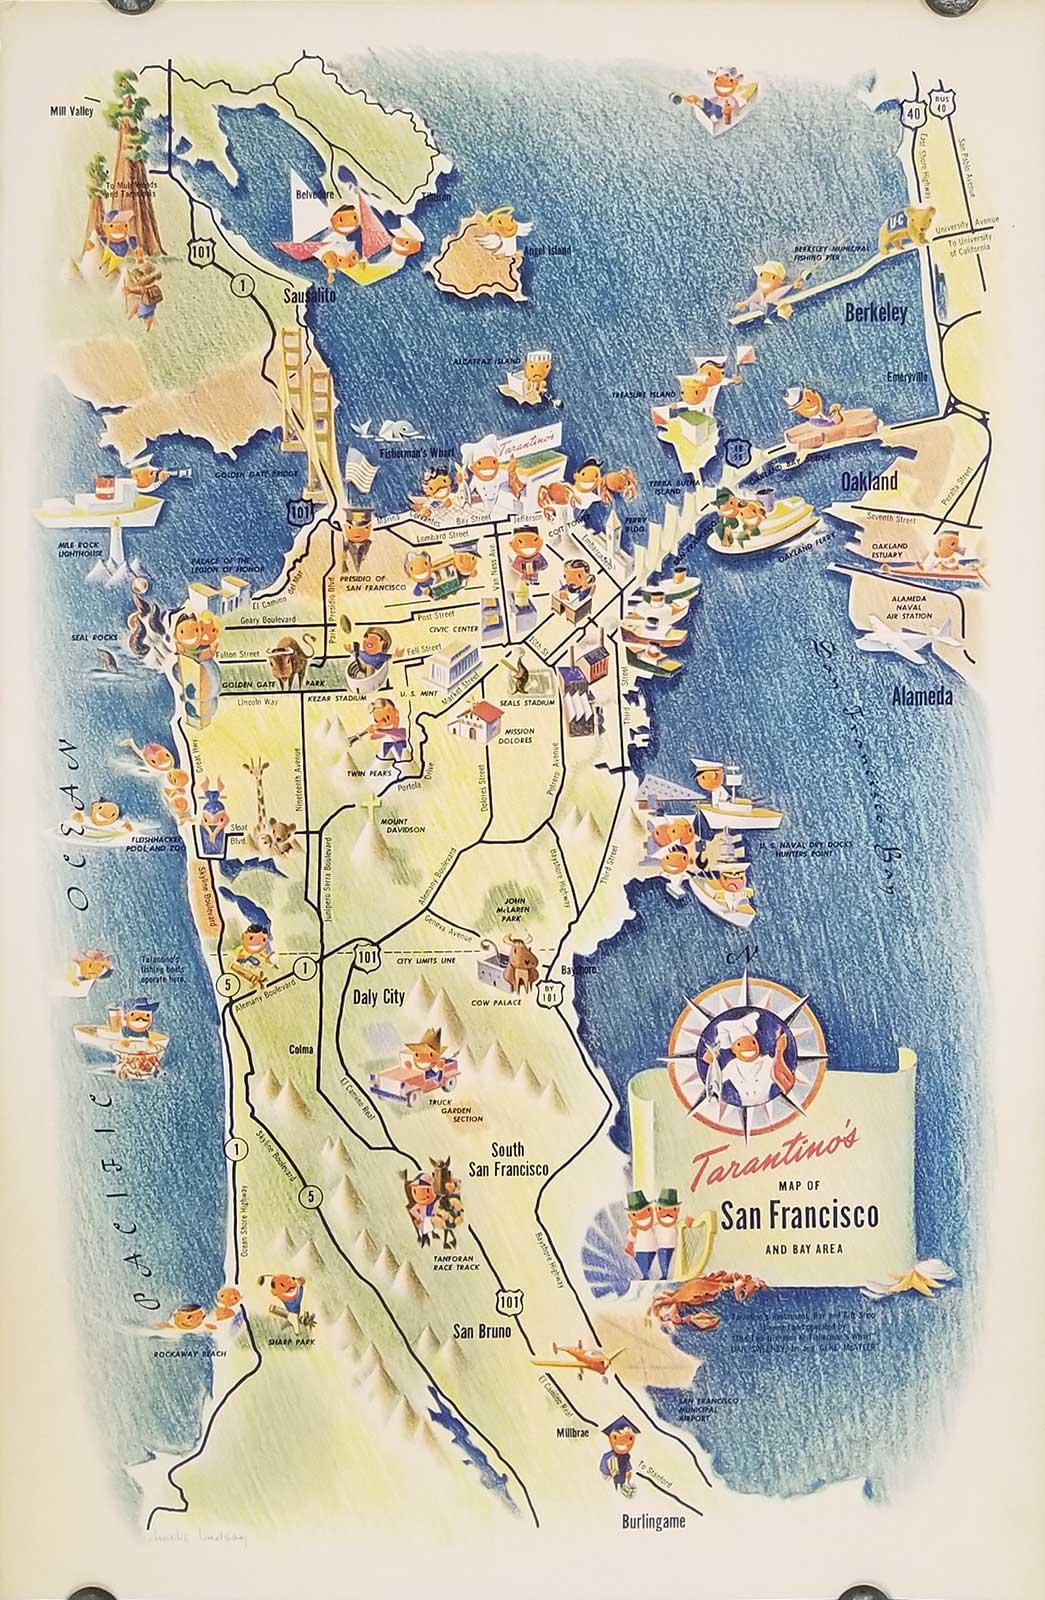 Lindsay California Map.Tarantino S Map Of San Francisco And The Bay Area By California